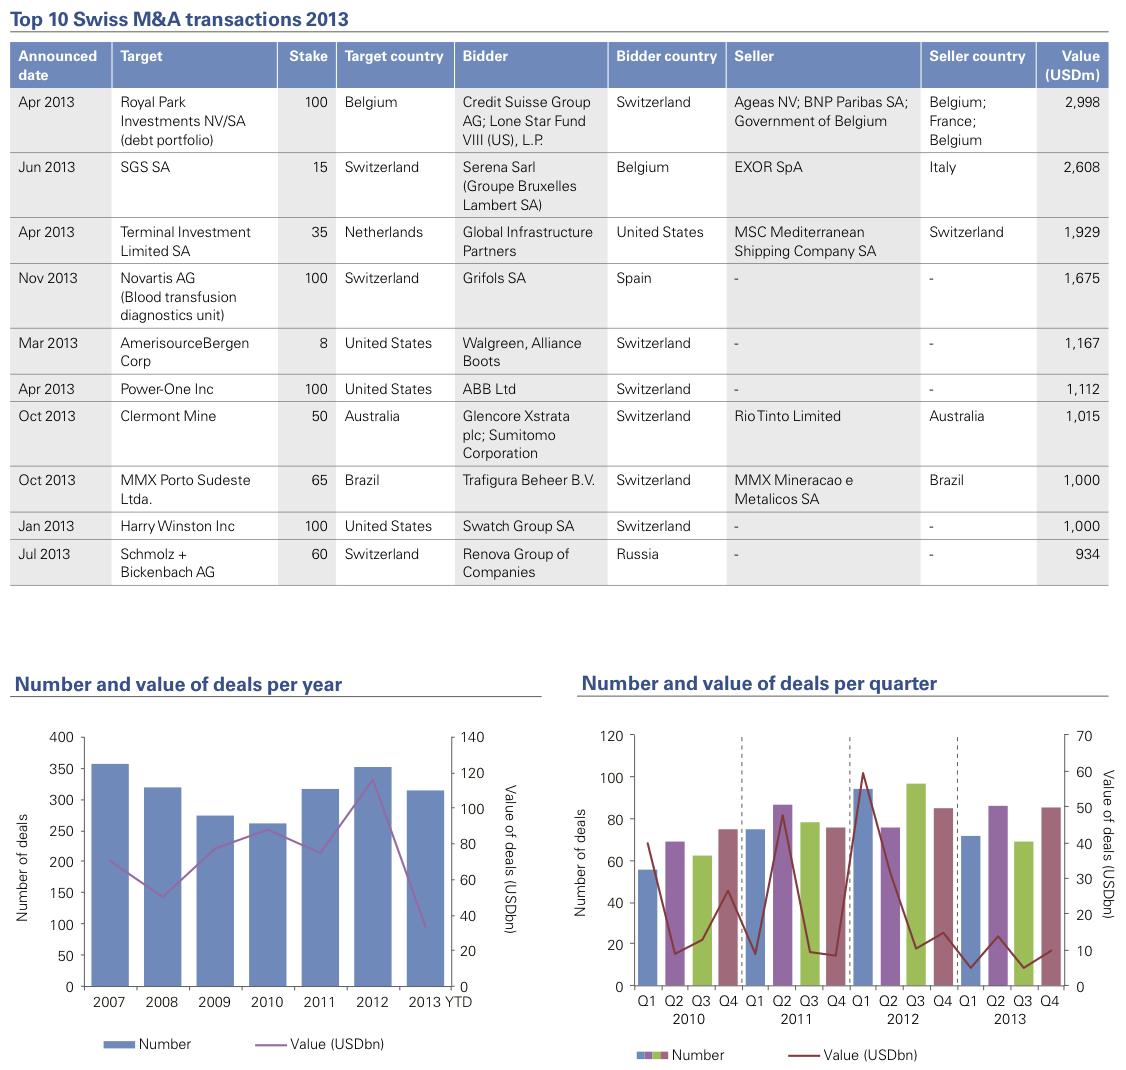 Figure 1: Top 10 Swiss M&A transactions 2013